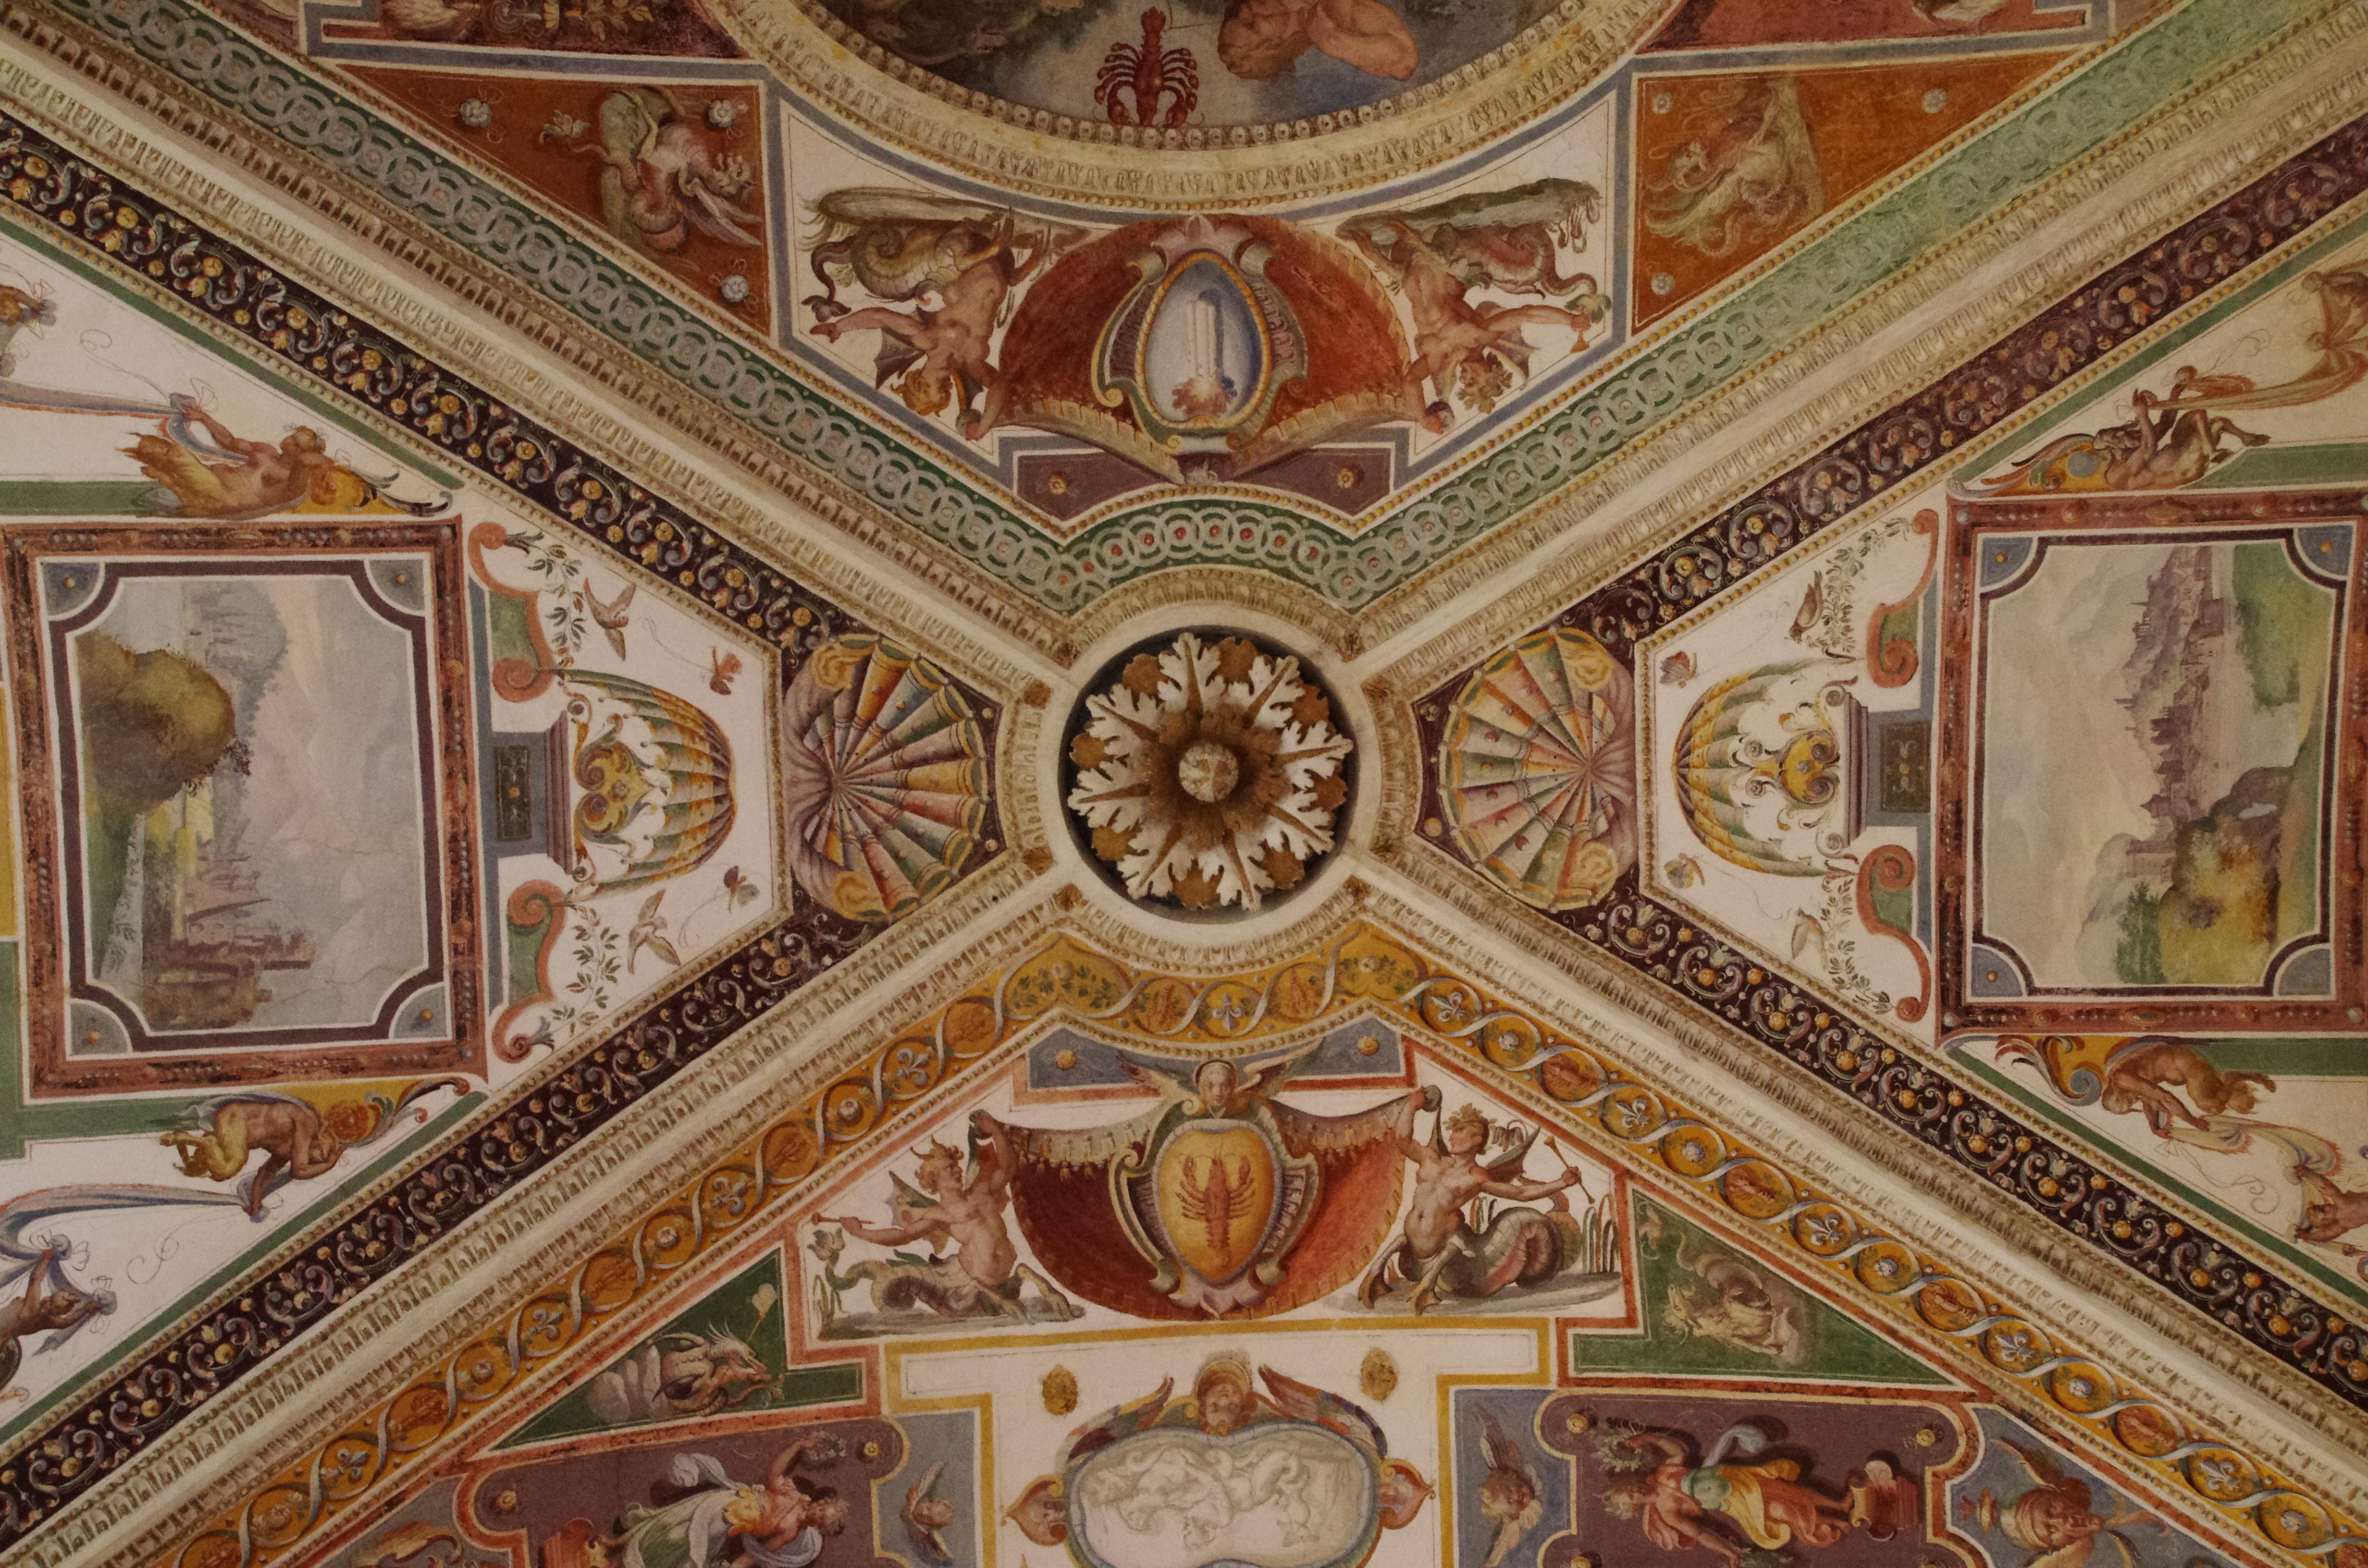 Photo Paolo Villa VR 2016 (VT) F0164124 Bagnaia, Villa Lante, fontane, giardini geometrici all'italiana, sculture, canelette, siepi, viali, affreschi, bassorilievi, architetture.jpg